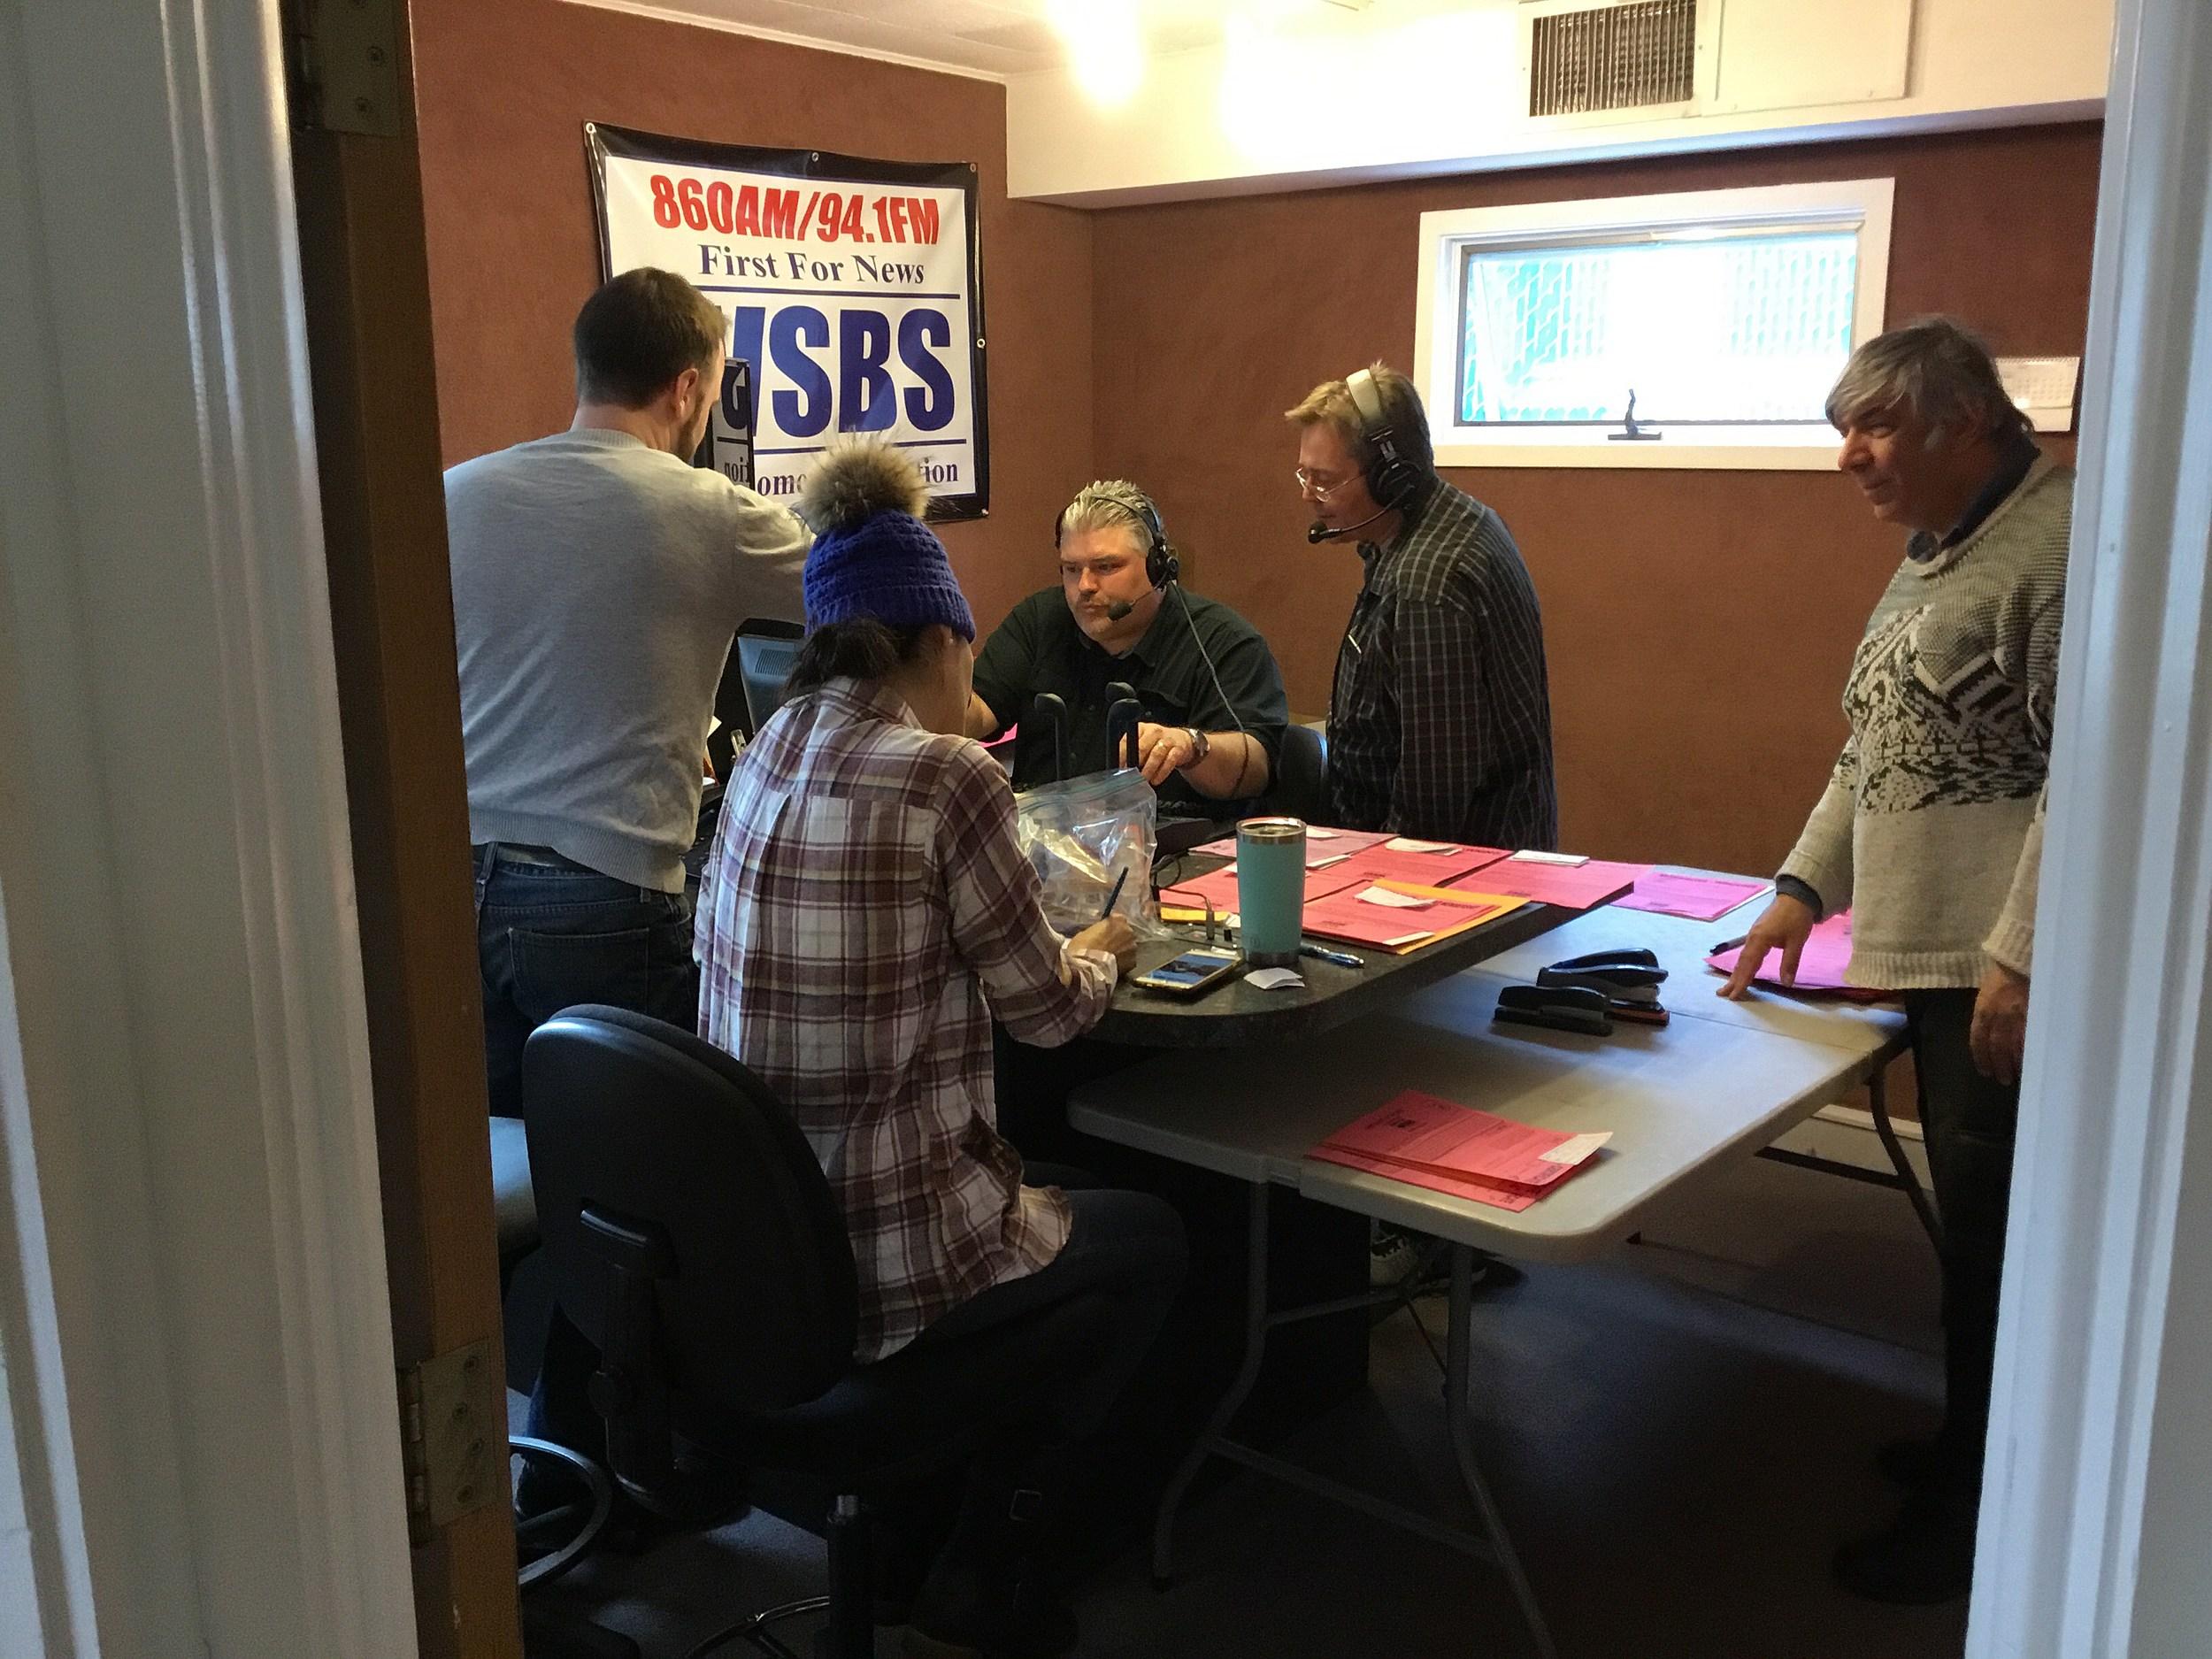 Great Radio Auction - WSBS 860AM, 94 1FM